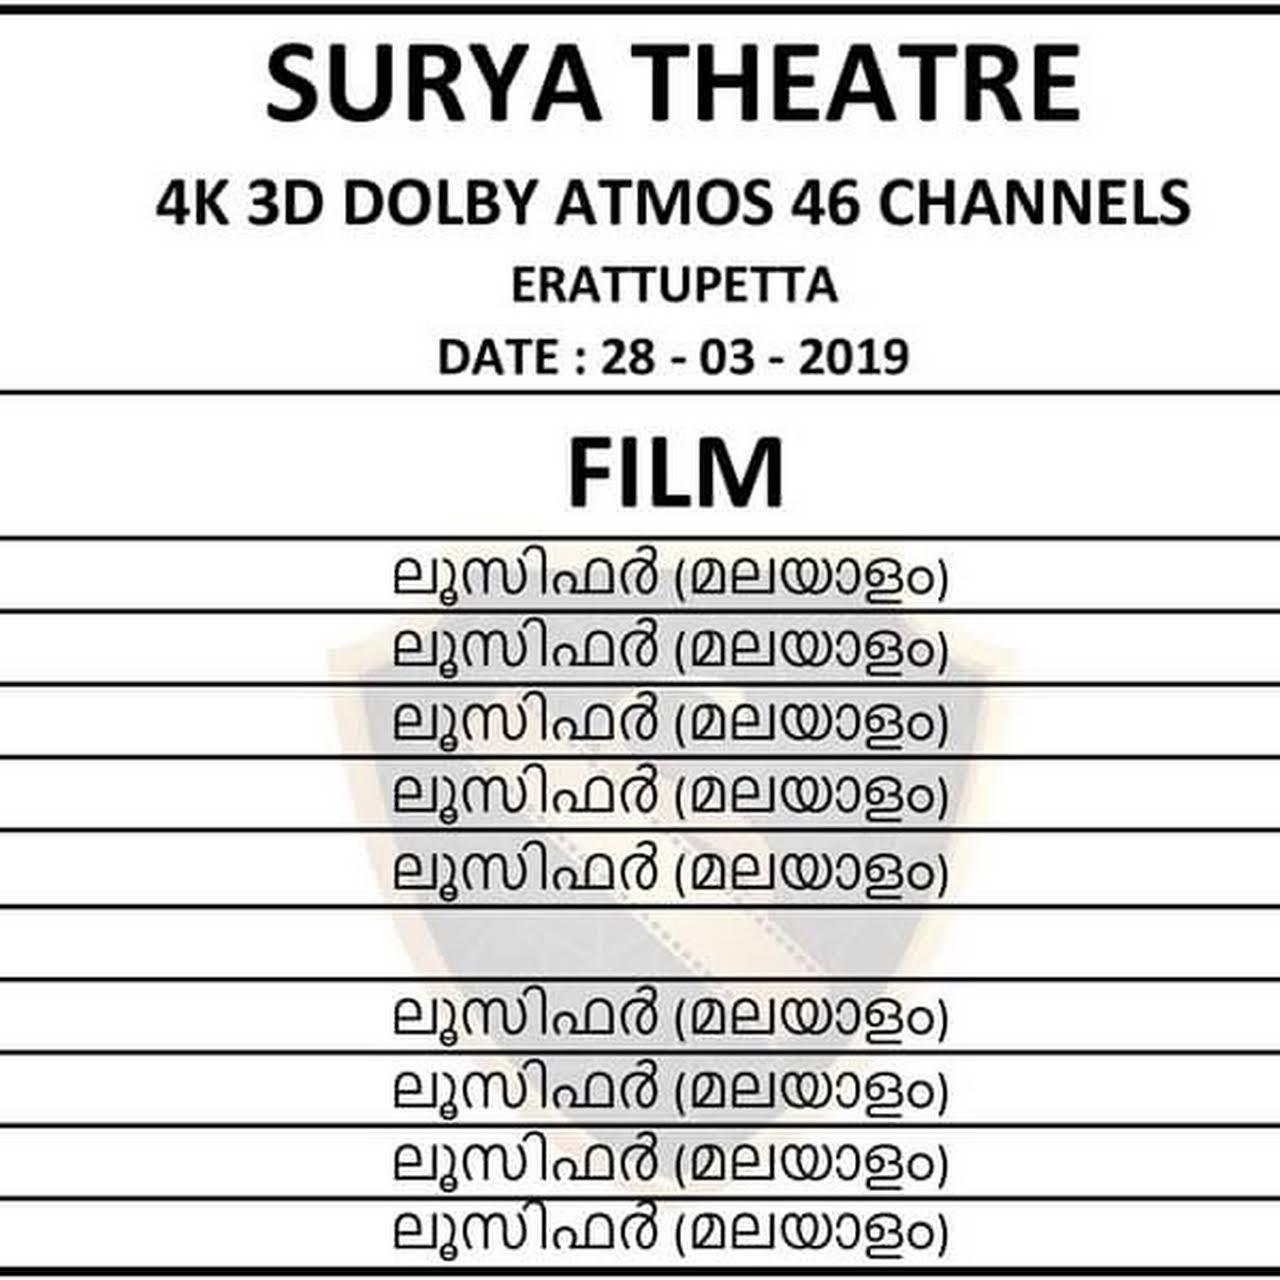 SURYA THEATRE, A/C 4K 3D Dolby Atmos - Cinema in Erattupetta